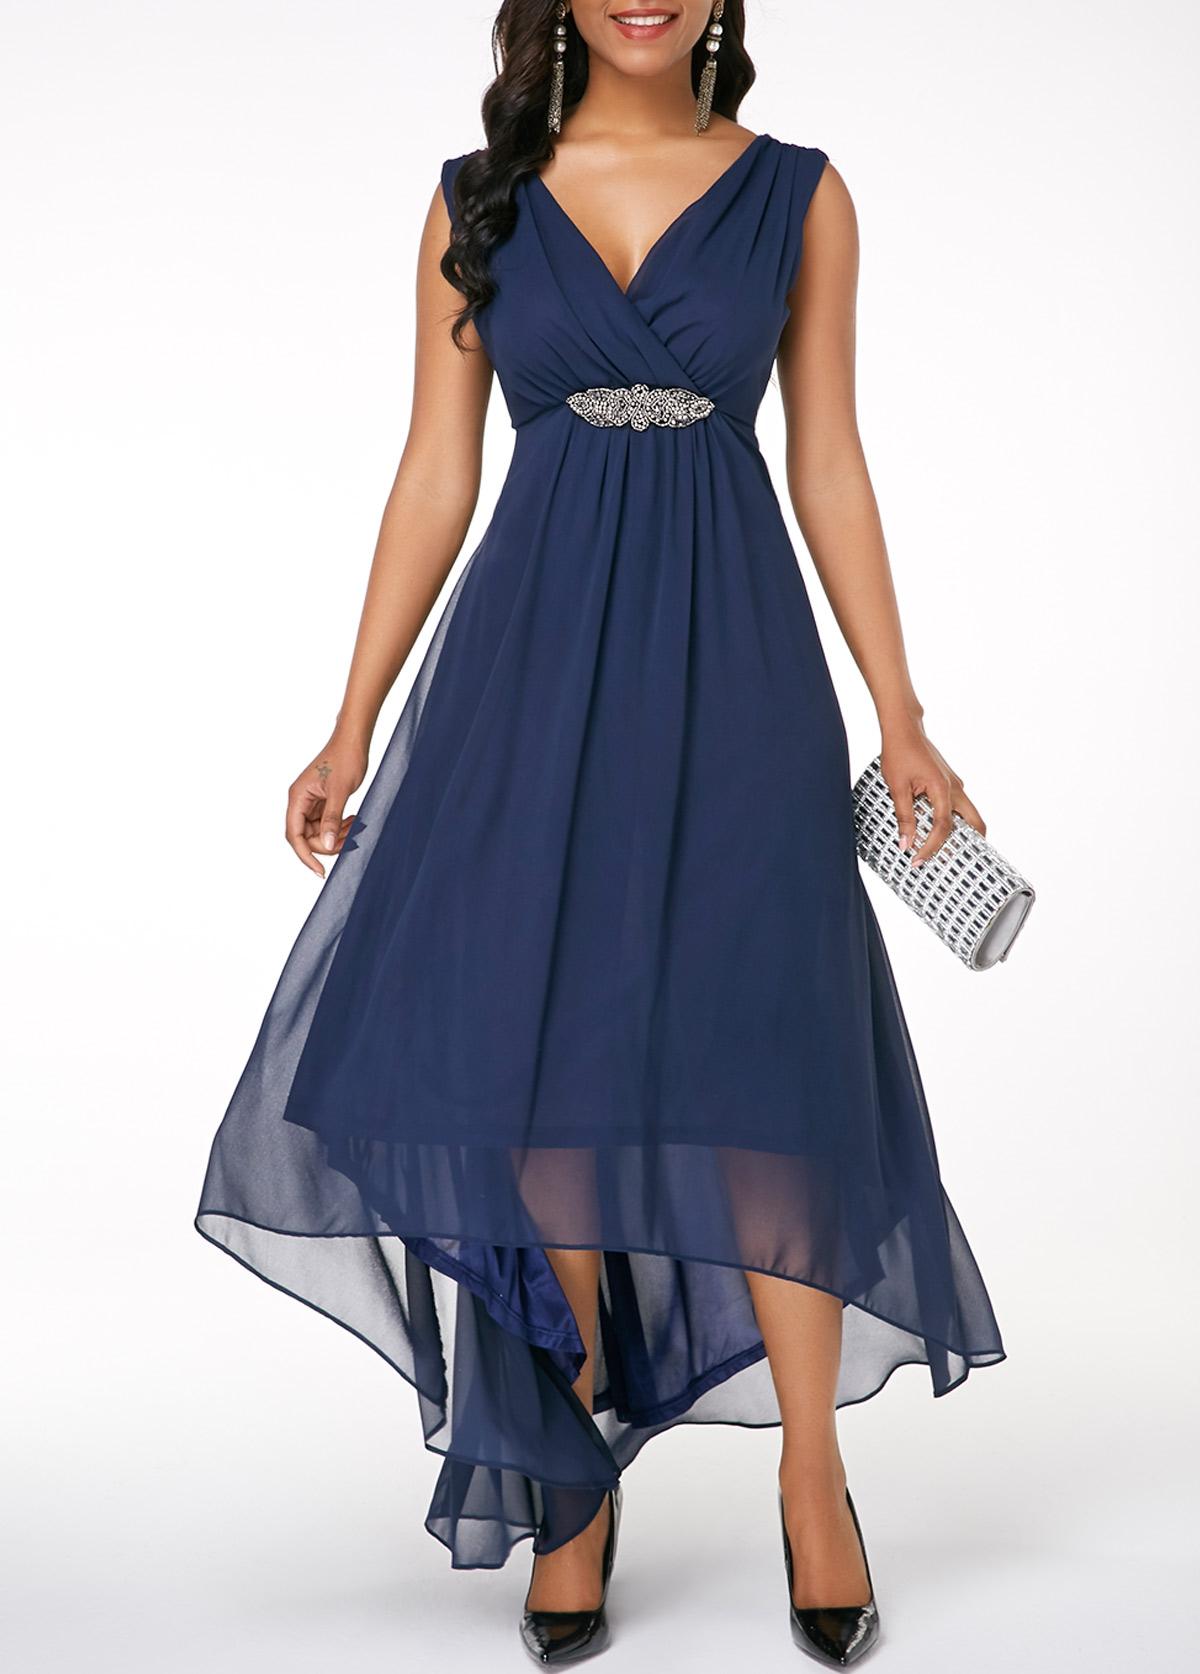 V Back Sleeveless High Low Navy Blue Dress